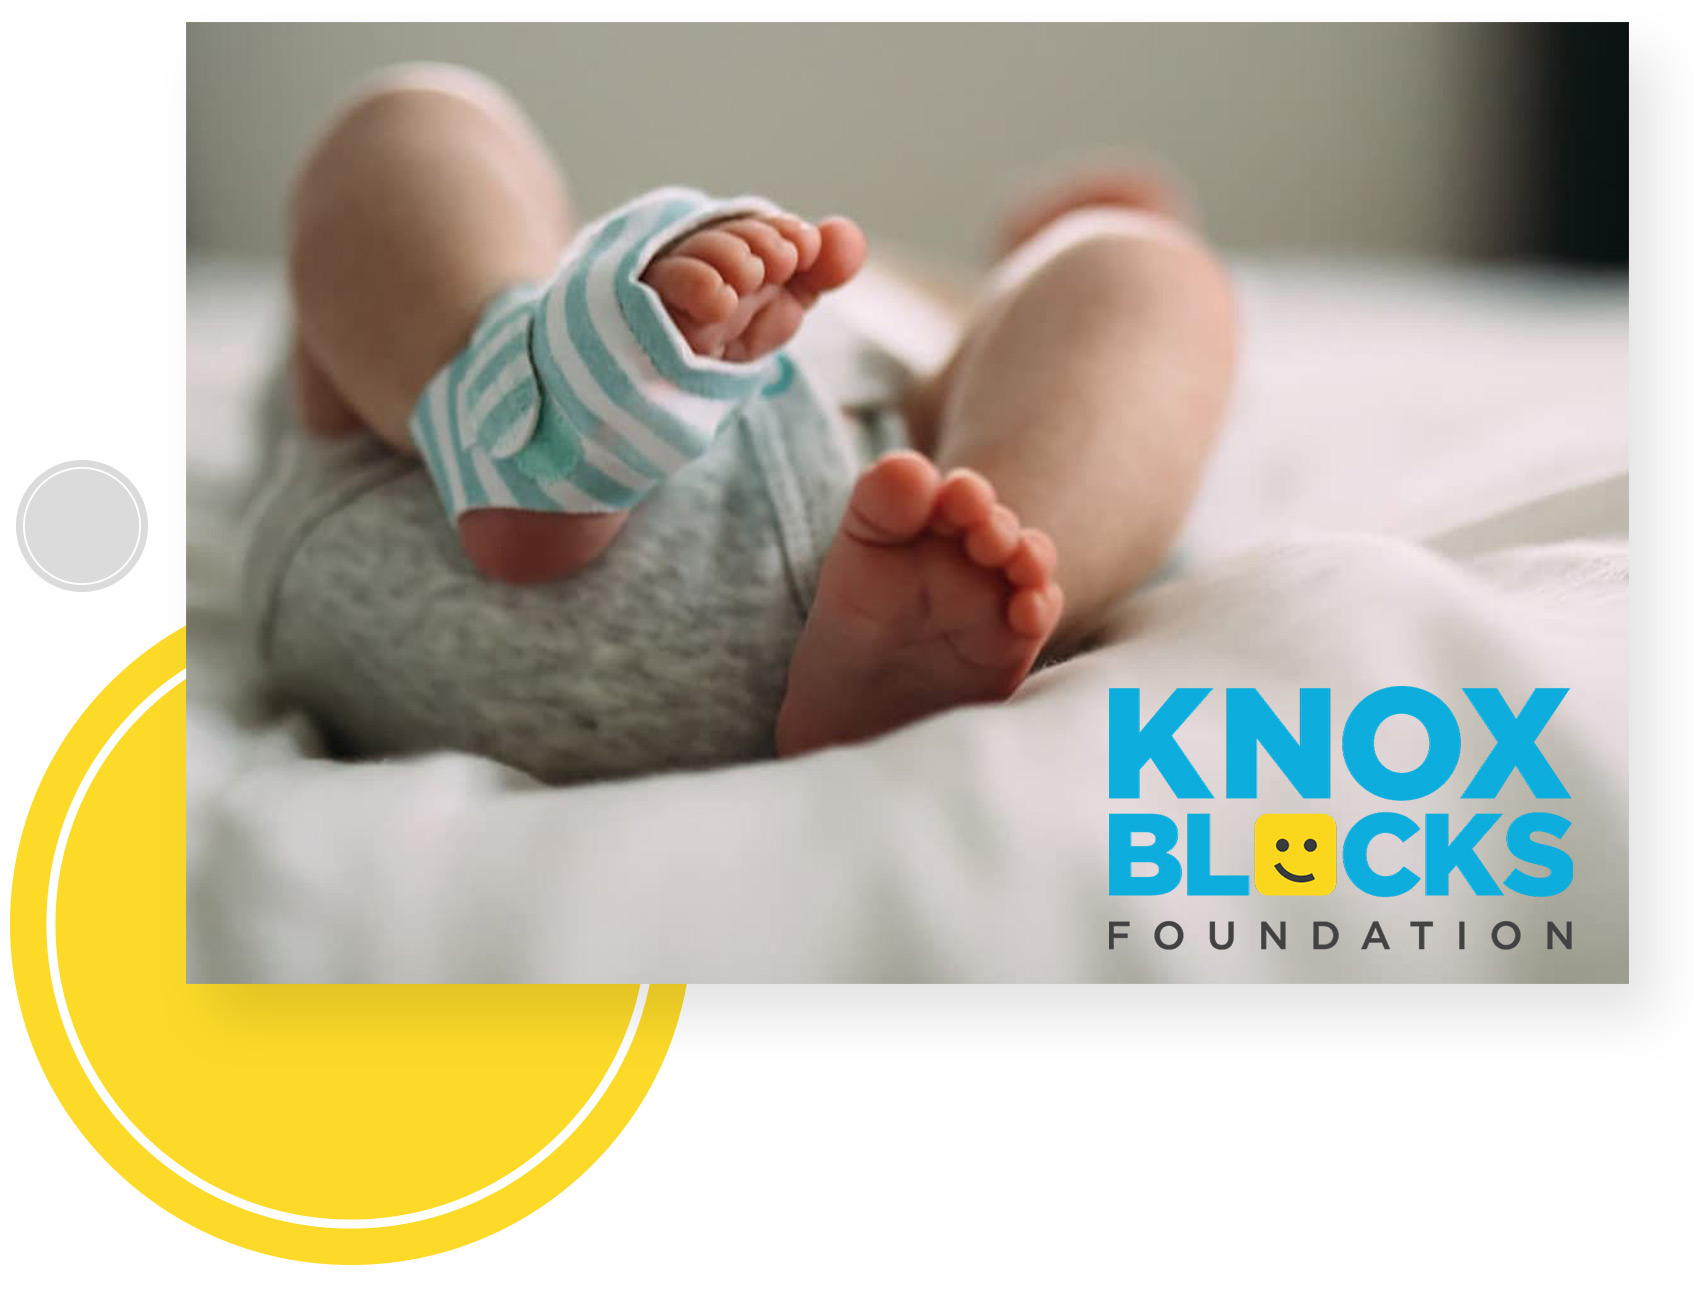 web-frame-KnoxBlocks-2.jpg